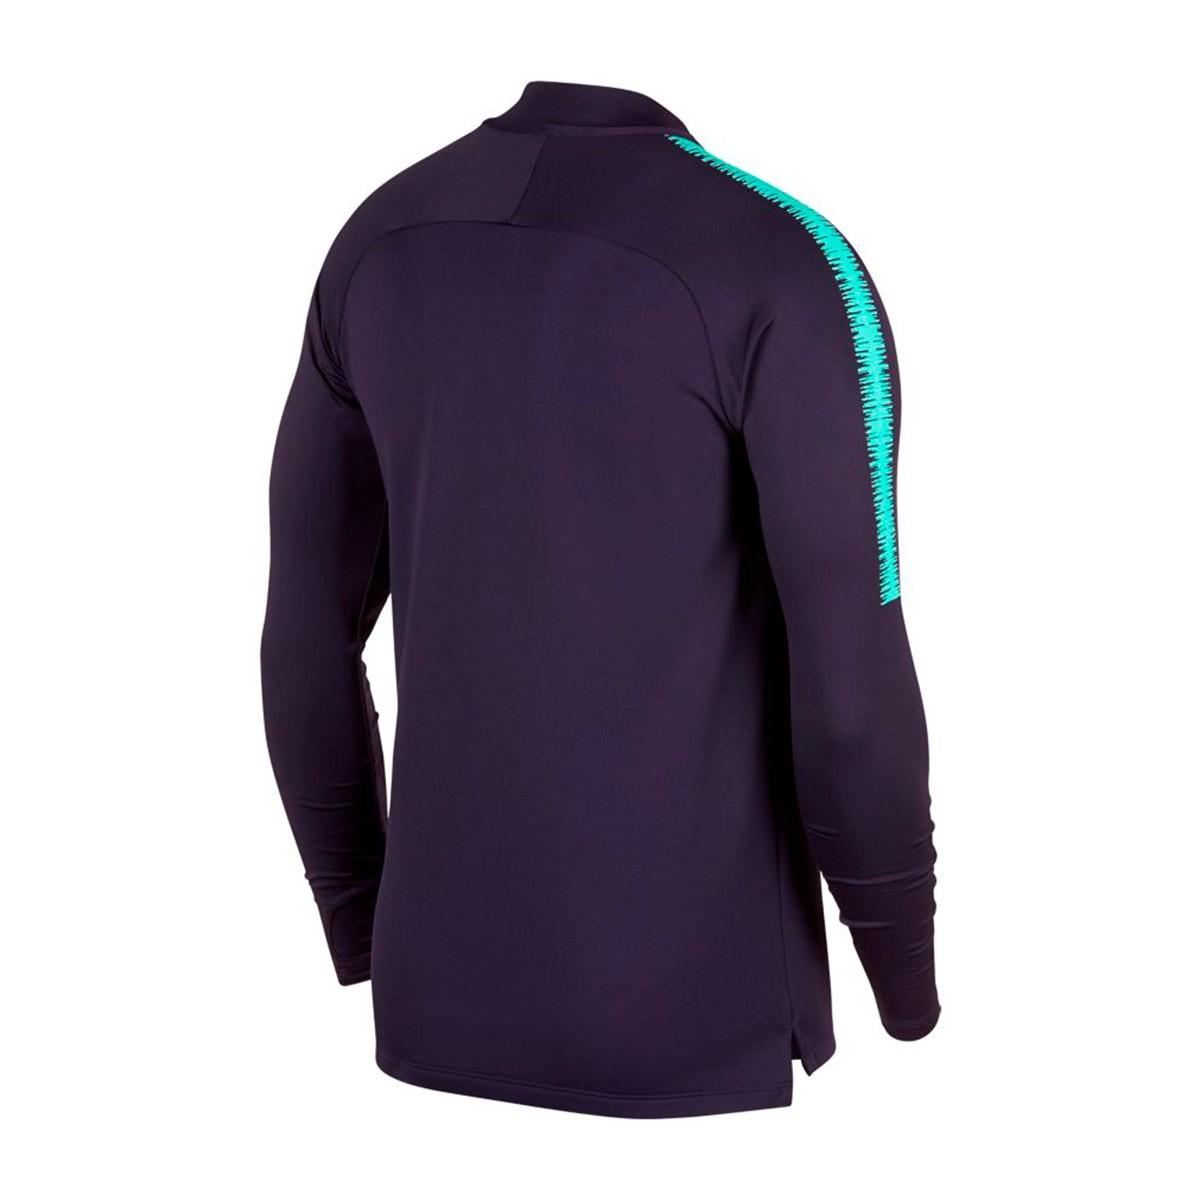 66c32f5ca Sweatshirt Nike FC Barcelona Dry Squad 2018-2019 Purple dynasty-Hyper  turquoise - Tienda de fútbol Fútbol Emotion